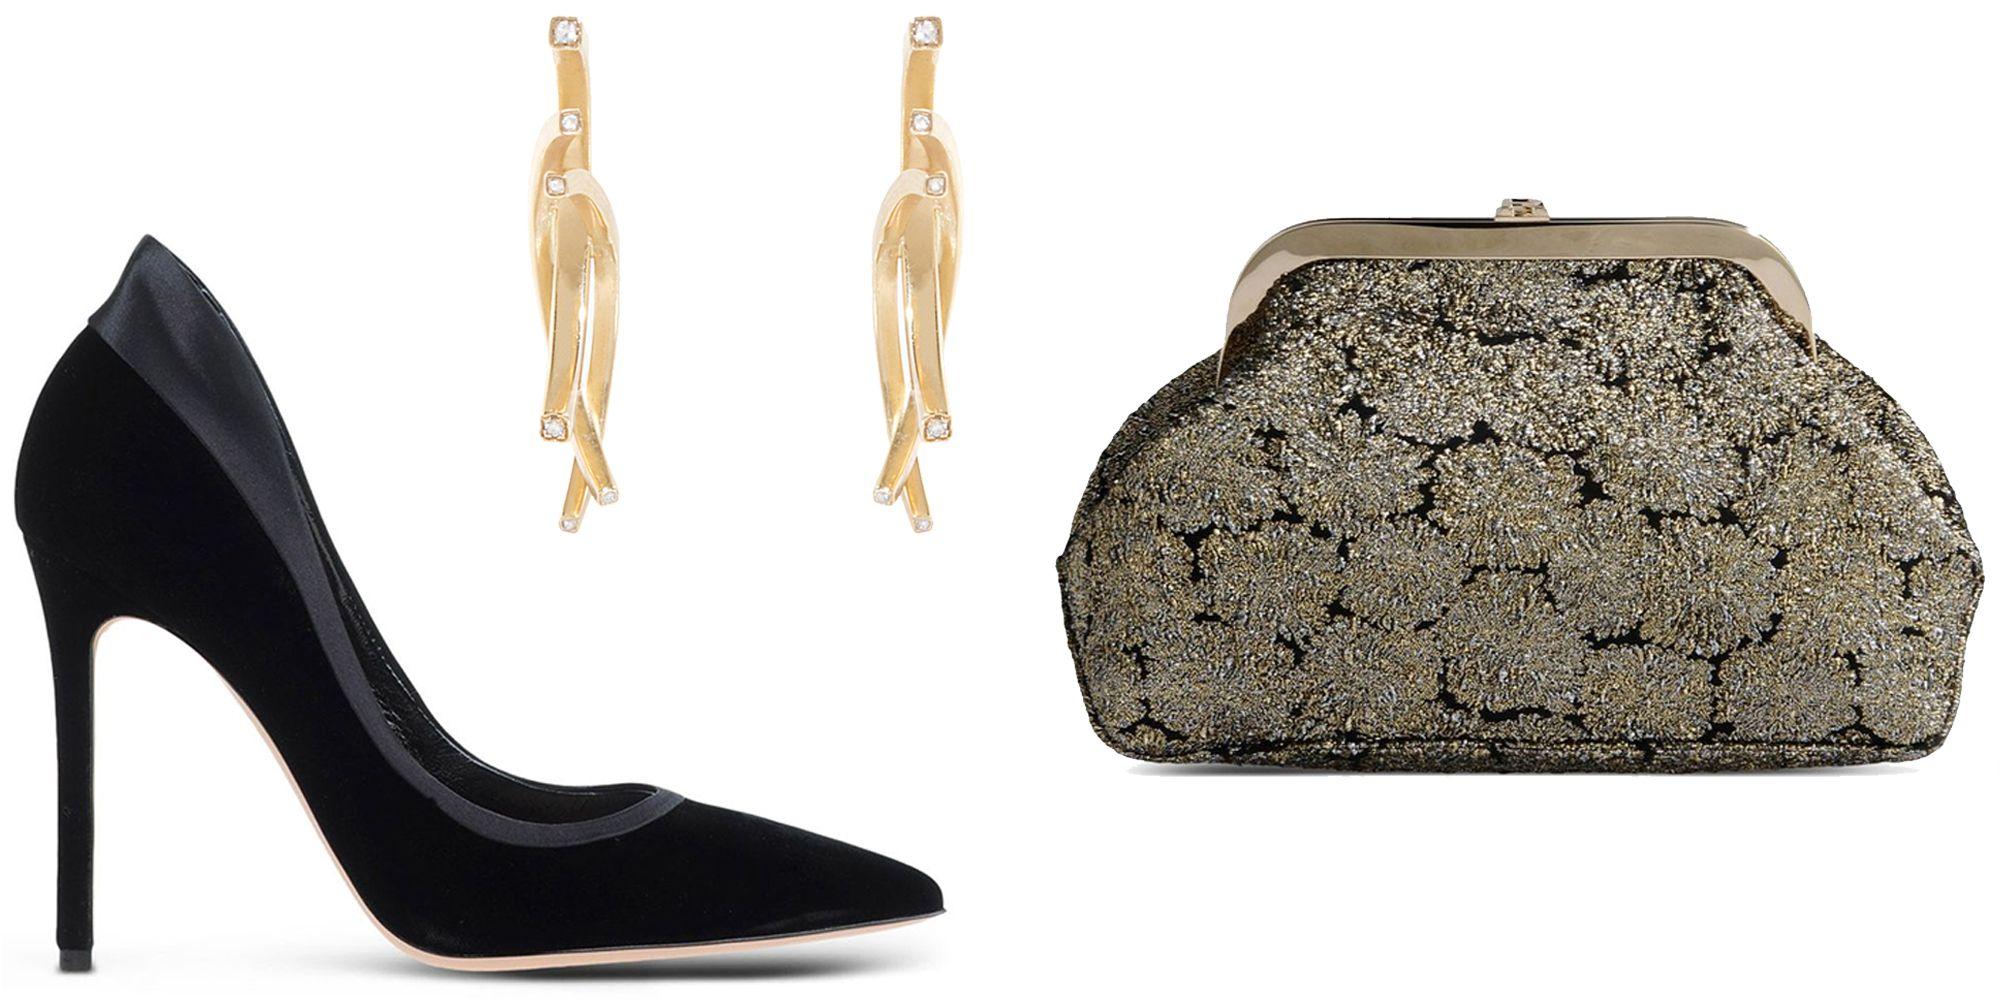 "<p><em>Gianvito Rossi pumps, $950, <a href=""https://shop.harpersbazaar.com/designers/g/gianvito-rossi/velvet-and-satin-pump-5000.html"" target=""_blank"">shopBAZAAR.com</a>; Tilda Biehn earrings, $1,750, <a href=""https://shop.harpersbazaar.com/designers/g/gianvito-rossi/velvet-and-satin-pump-5000.html"" target=""_blank"">shopBAZAAR.com</a>; Rochas clutch, $905, </em><a href=""https://shop.harpersbazaar.com/designers/r/rochas/brocade-clutch-5308.html"" target=""_blank""><em>shopBAZAAR.com</em></a></p>"